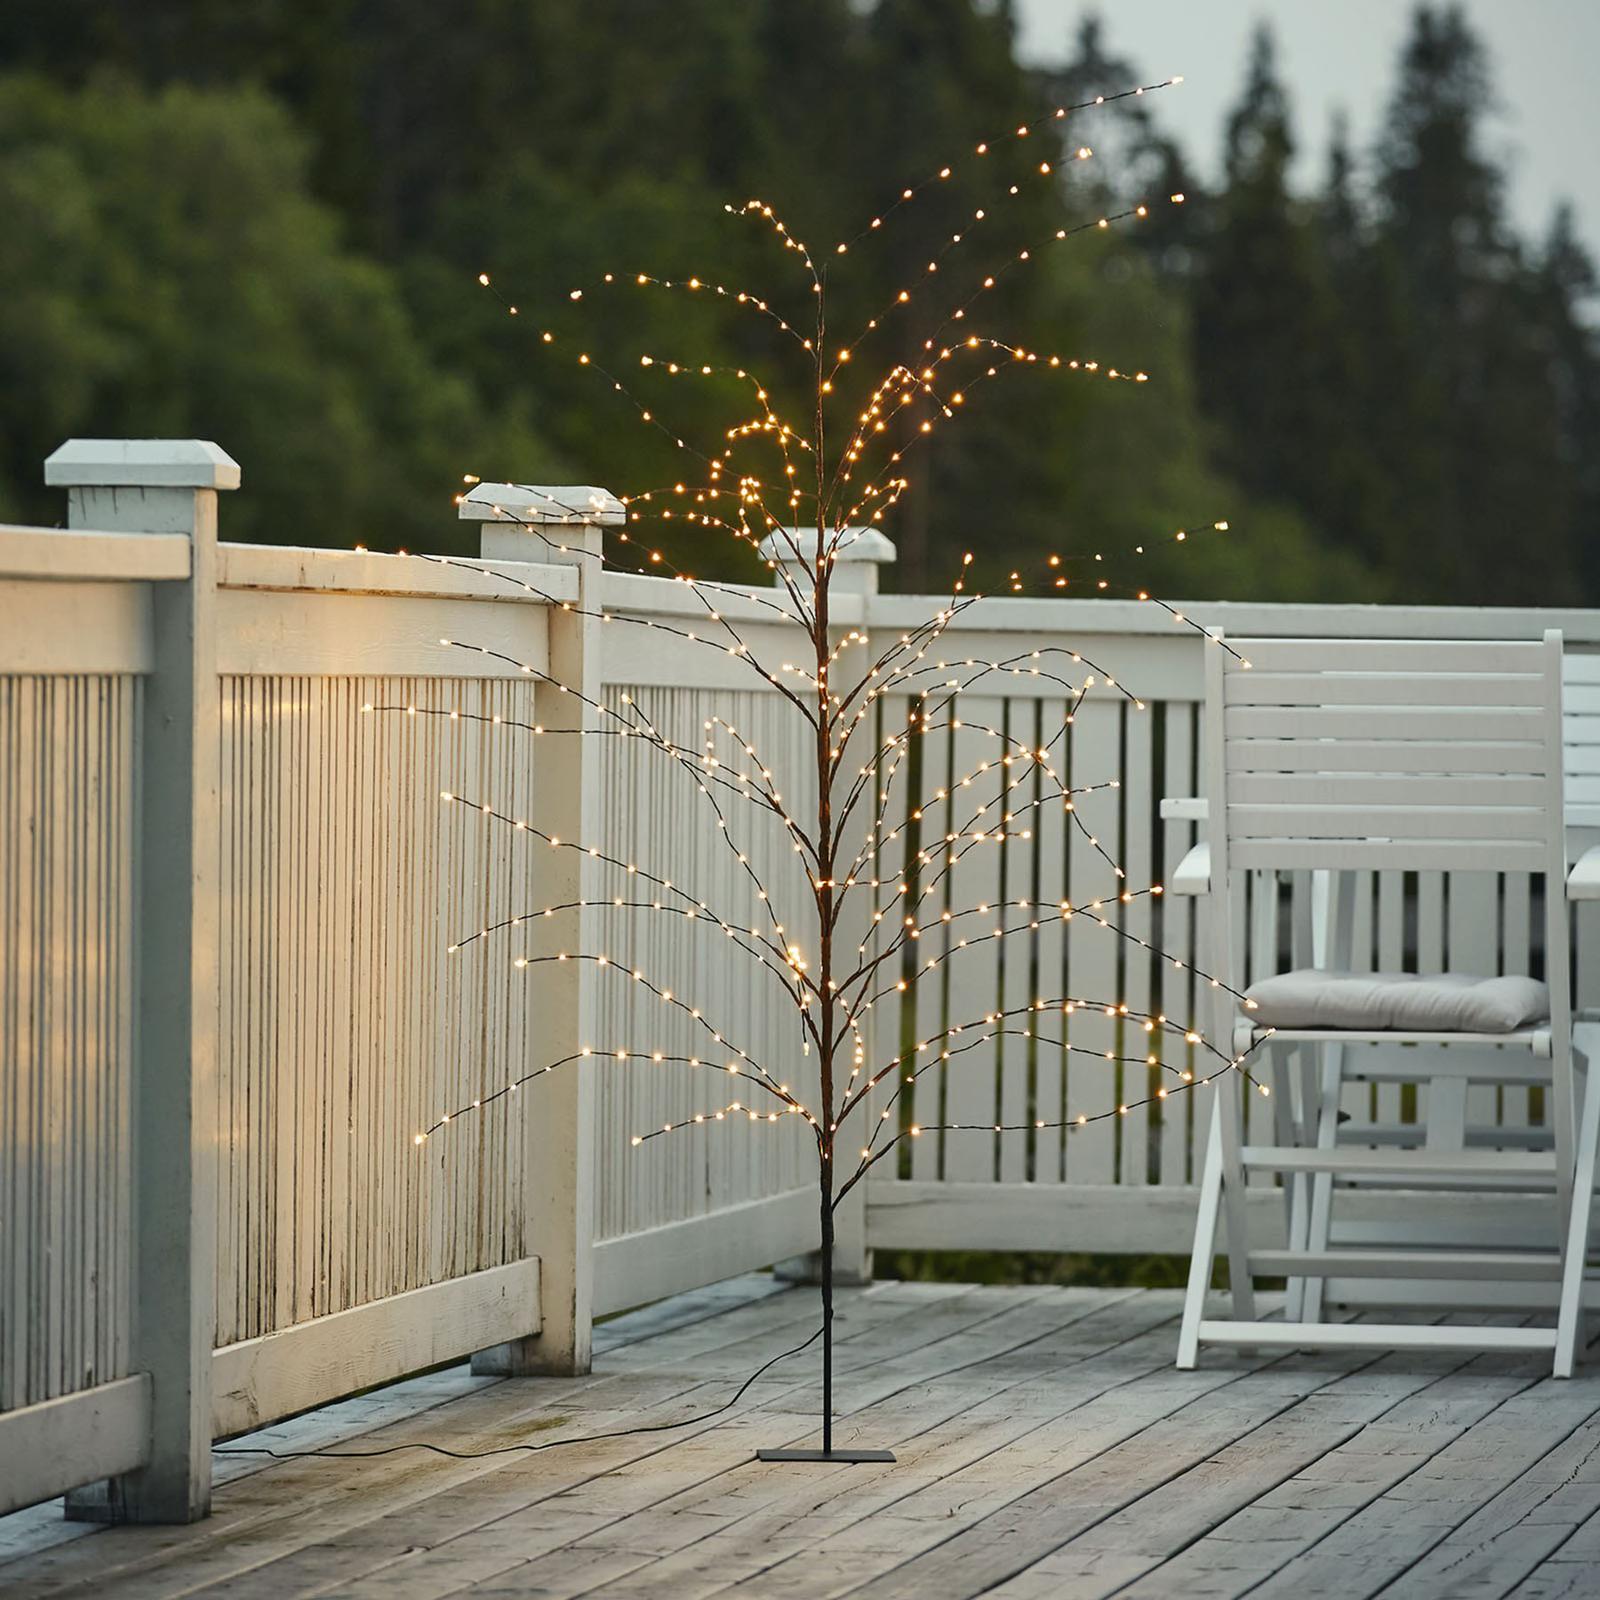 Lampada LED decorativa Reedy, alta 180 cm